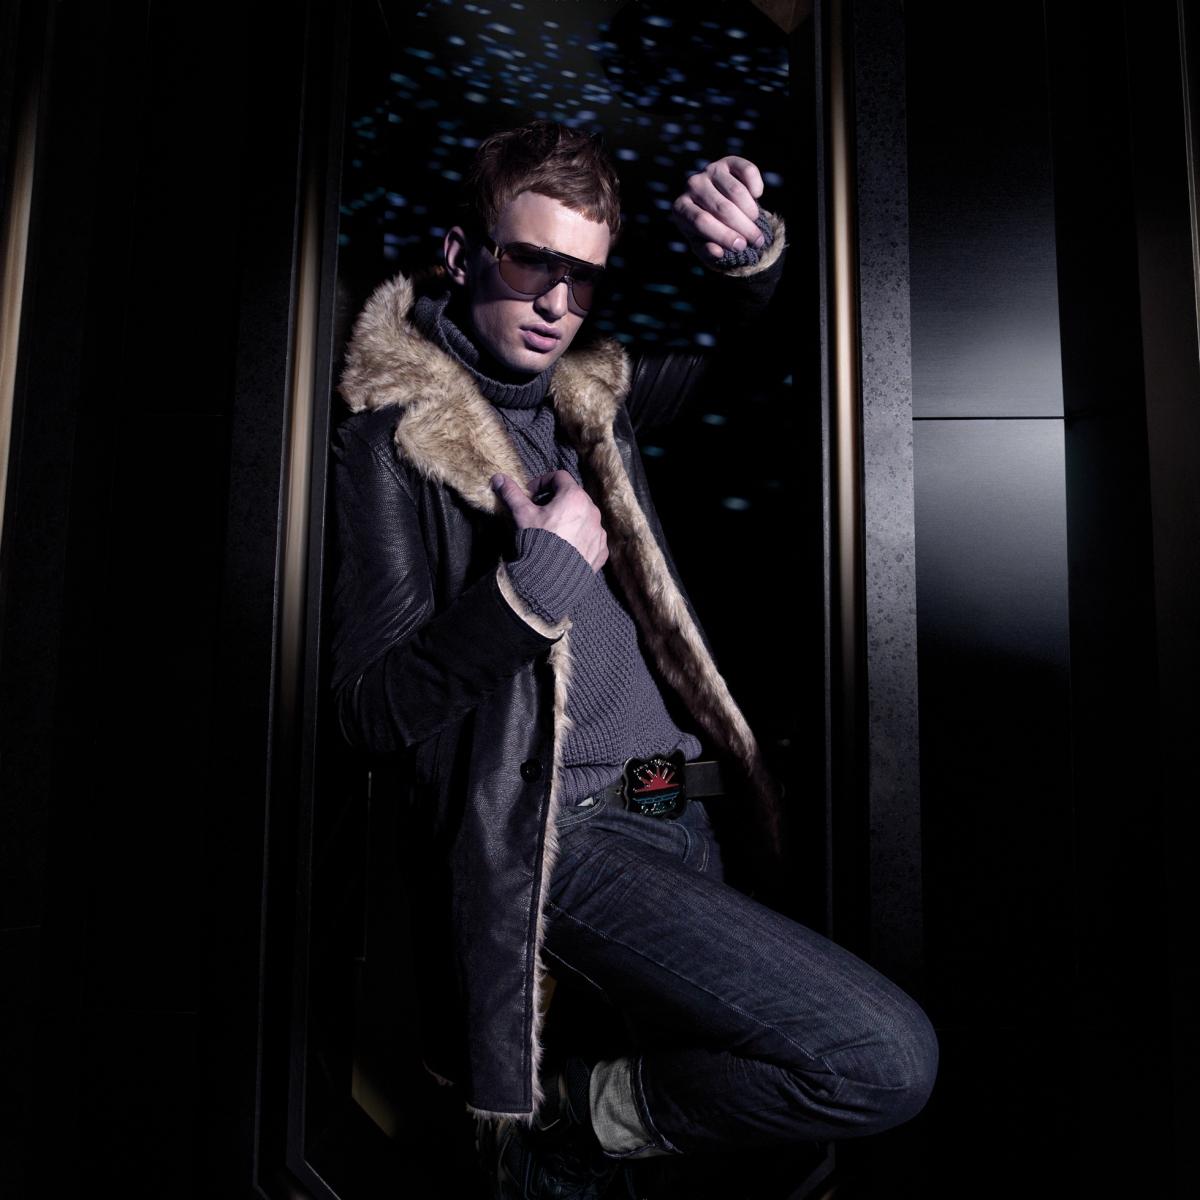 menswear, turtle-neck grey knit, fur trim leather coat, jeans | British Fashion Retail Brand - Magnum London :: 2008 FW collection lookbook